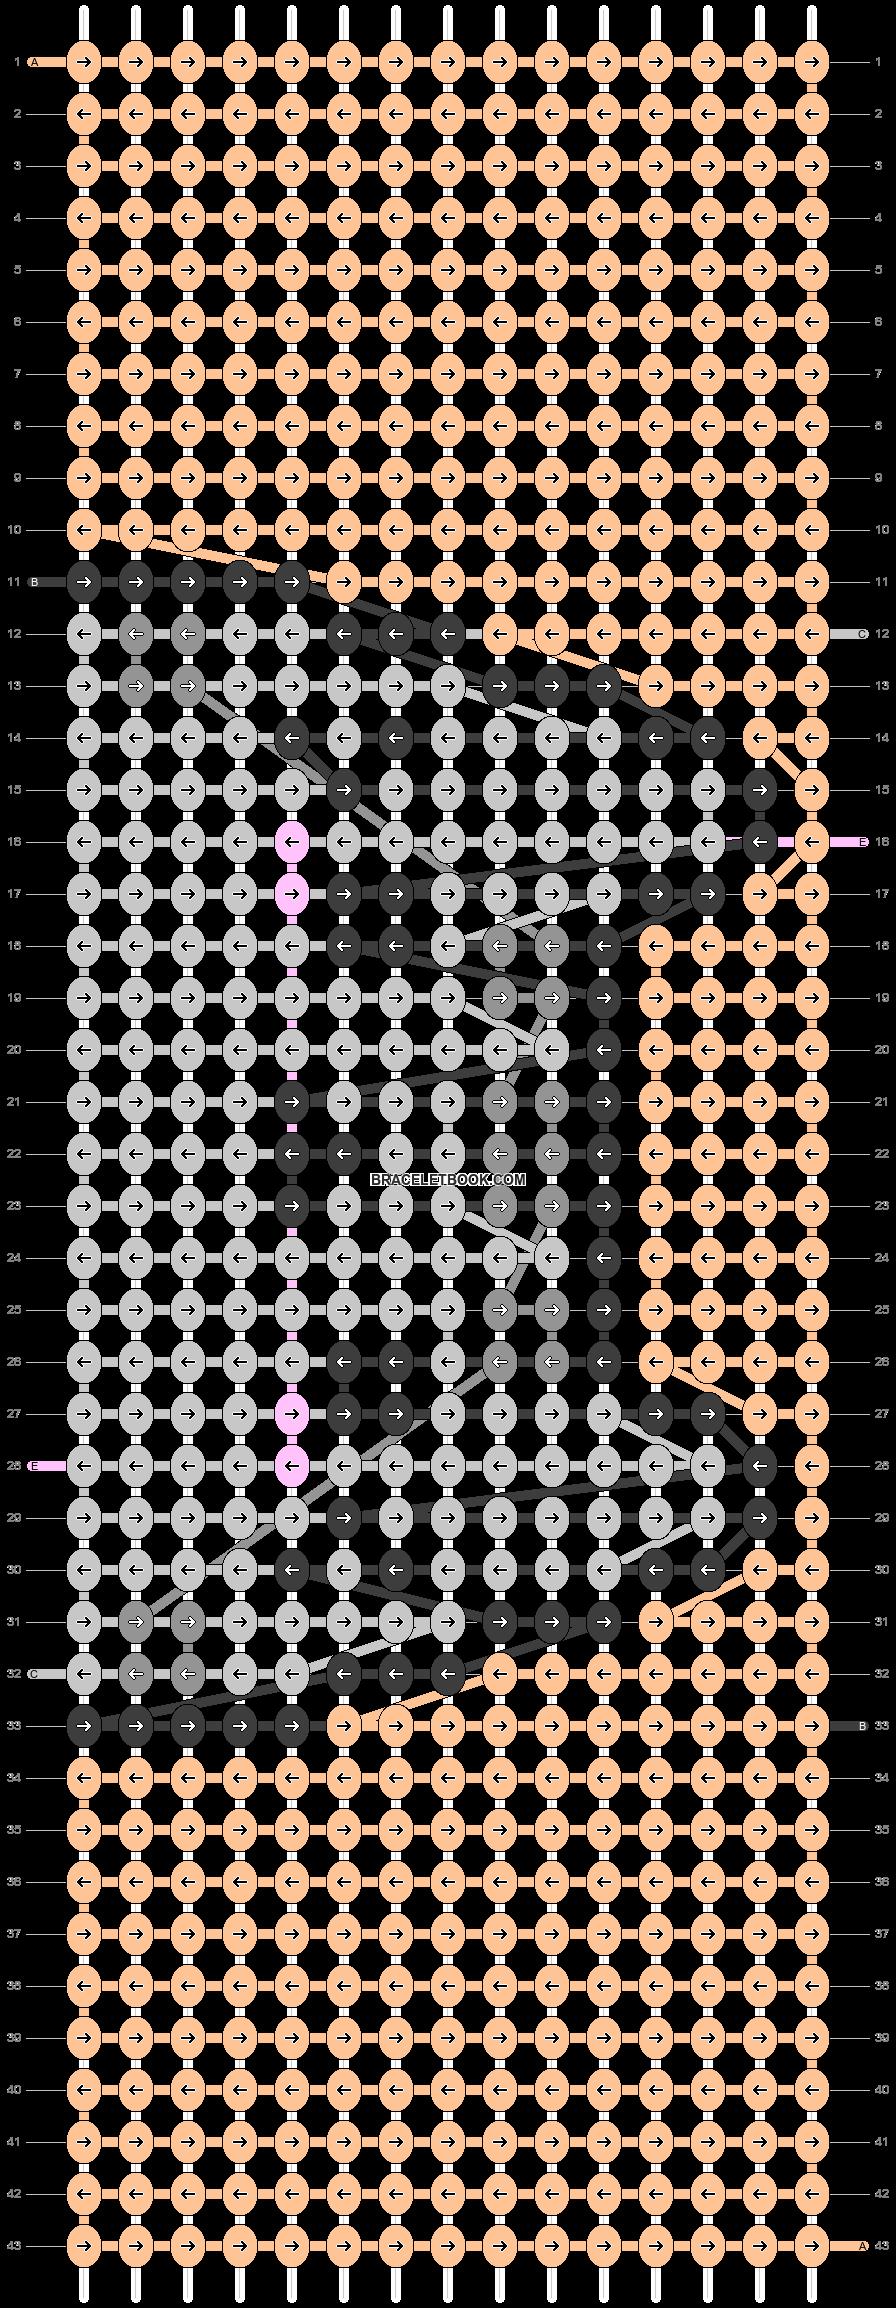 Alpha pattern #26406 variation #10391 pattern